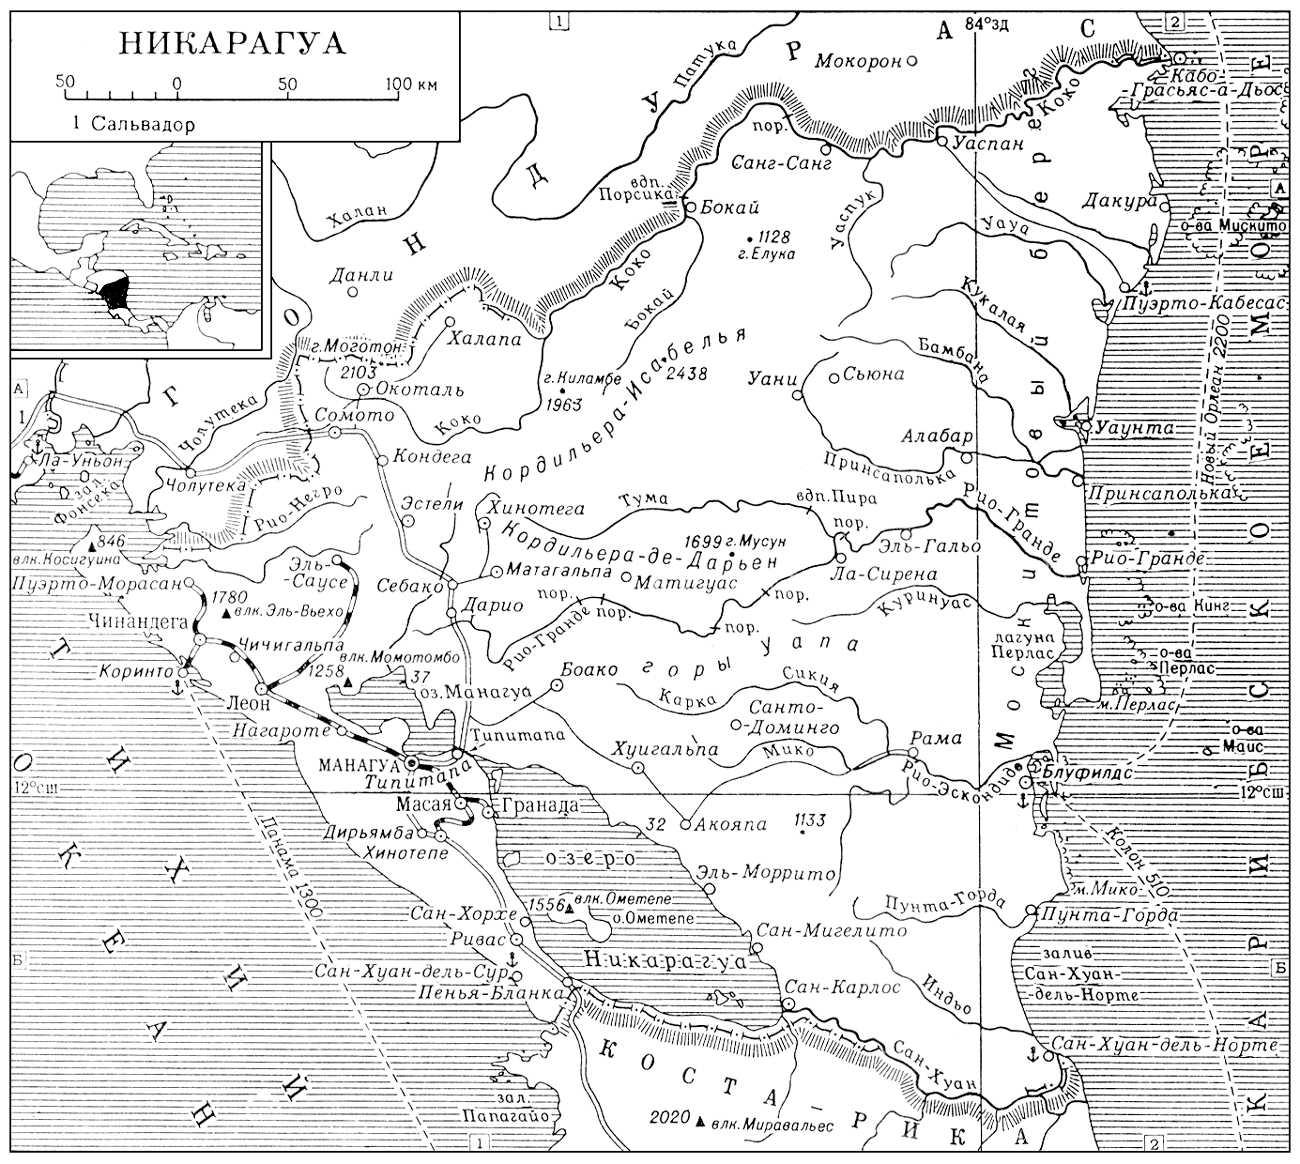 Никарагуа. Никарагуа (государство в Центр. Америке).